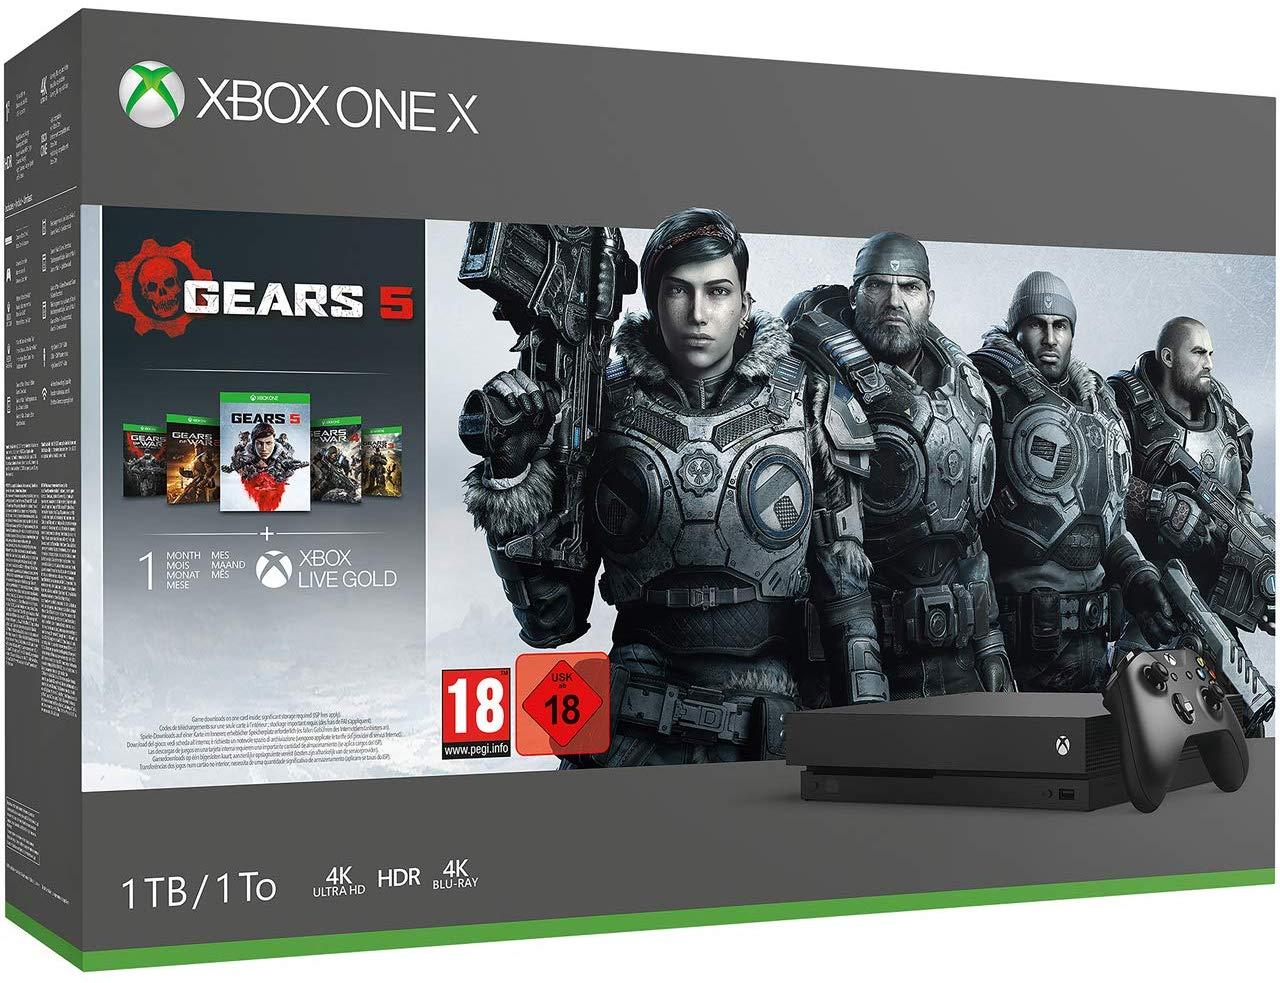 Xbox One X 1TB Console & Gears 5 / Star Wars Jedi: Fallen Order Bundle / Forza Horizon 4 LEGO Speed Bundle +FREE Headset for £259.99 @ Argos